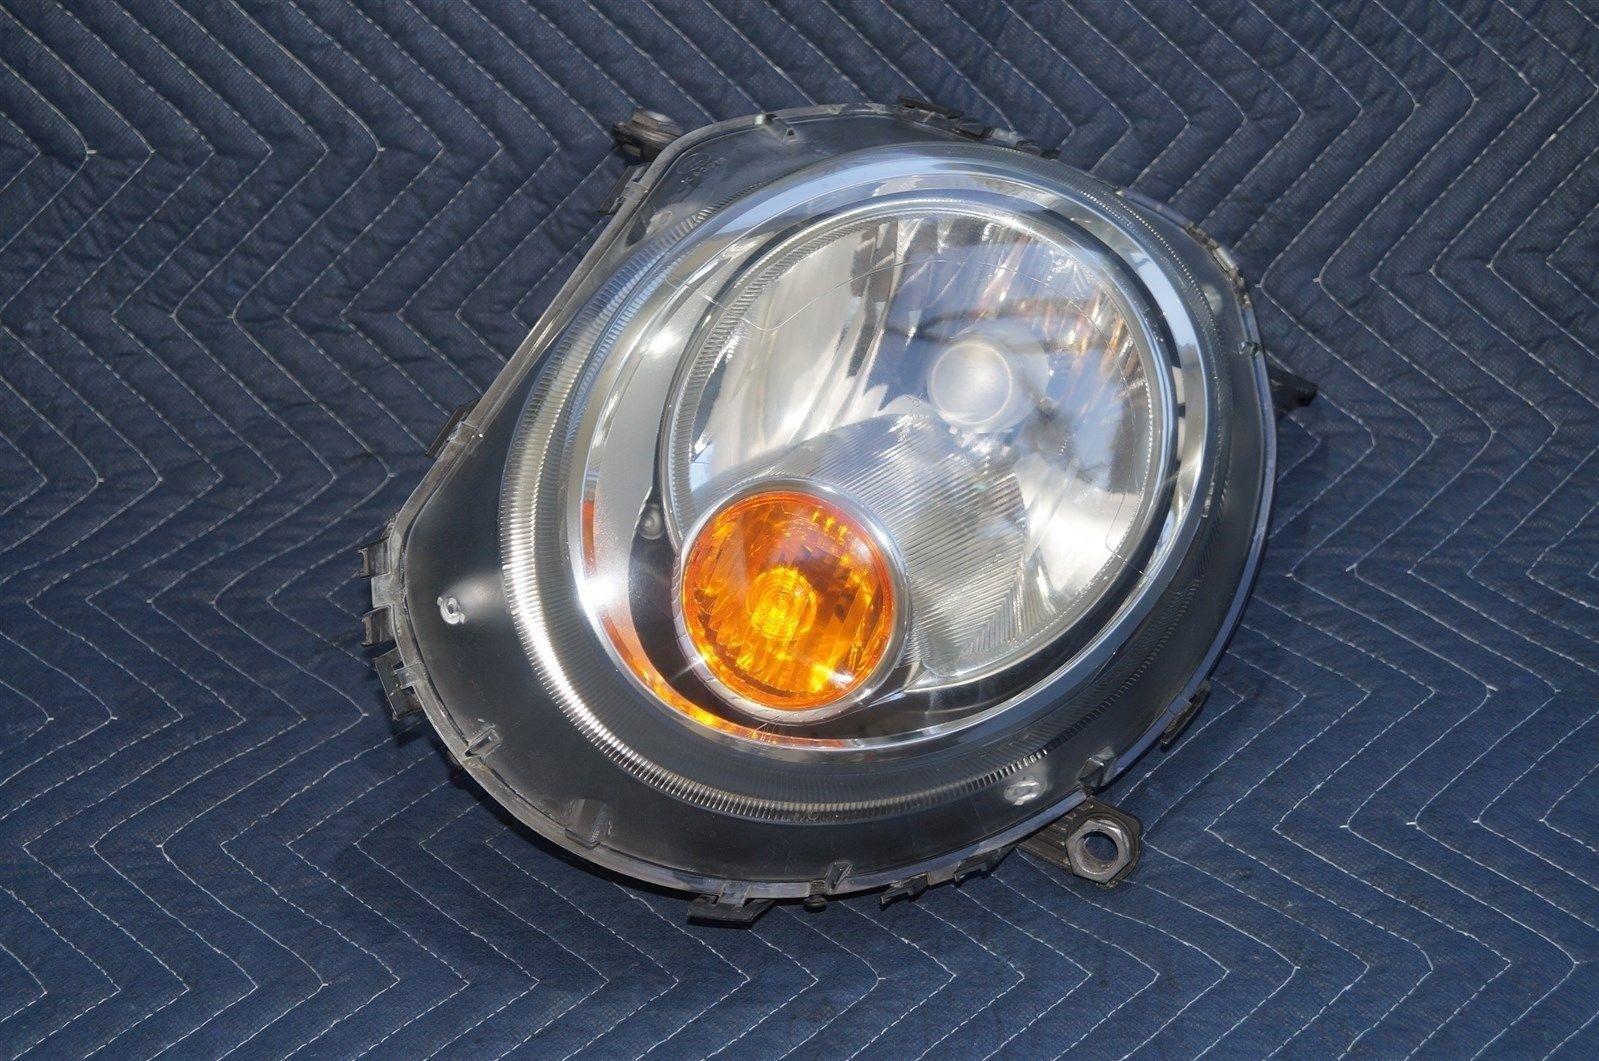 07-12 Mini Cooper Halogen Headlight Head Light Lamp Driver Left Side - LH